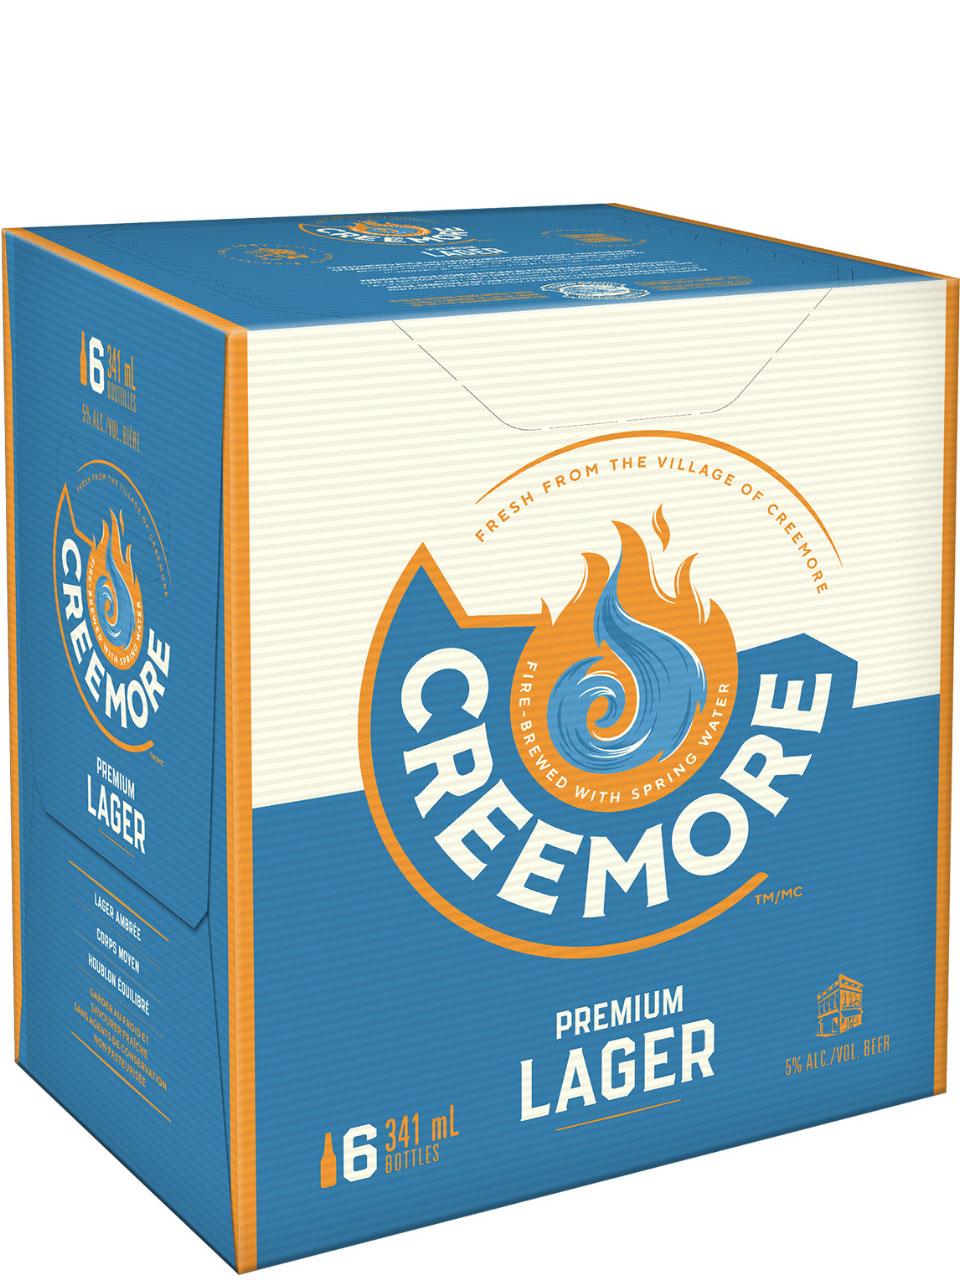 Creemore Springs Premium Lager 6 Pack Bottles